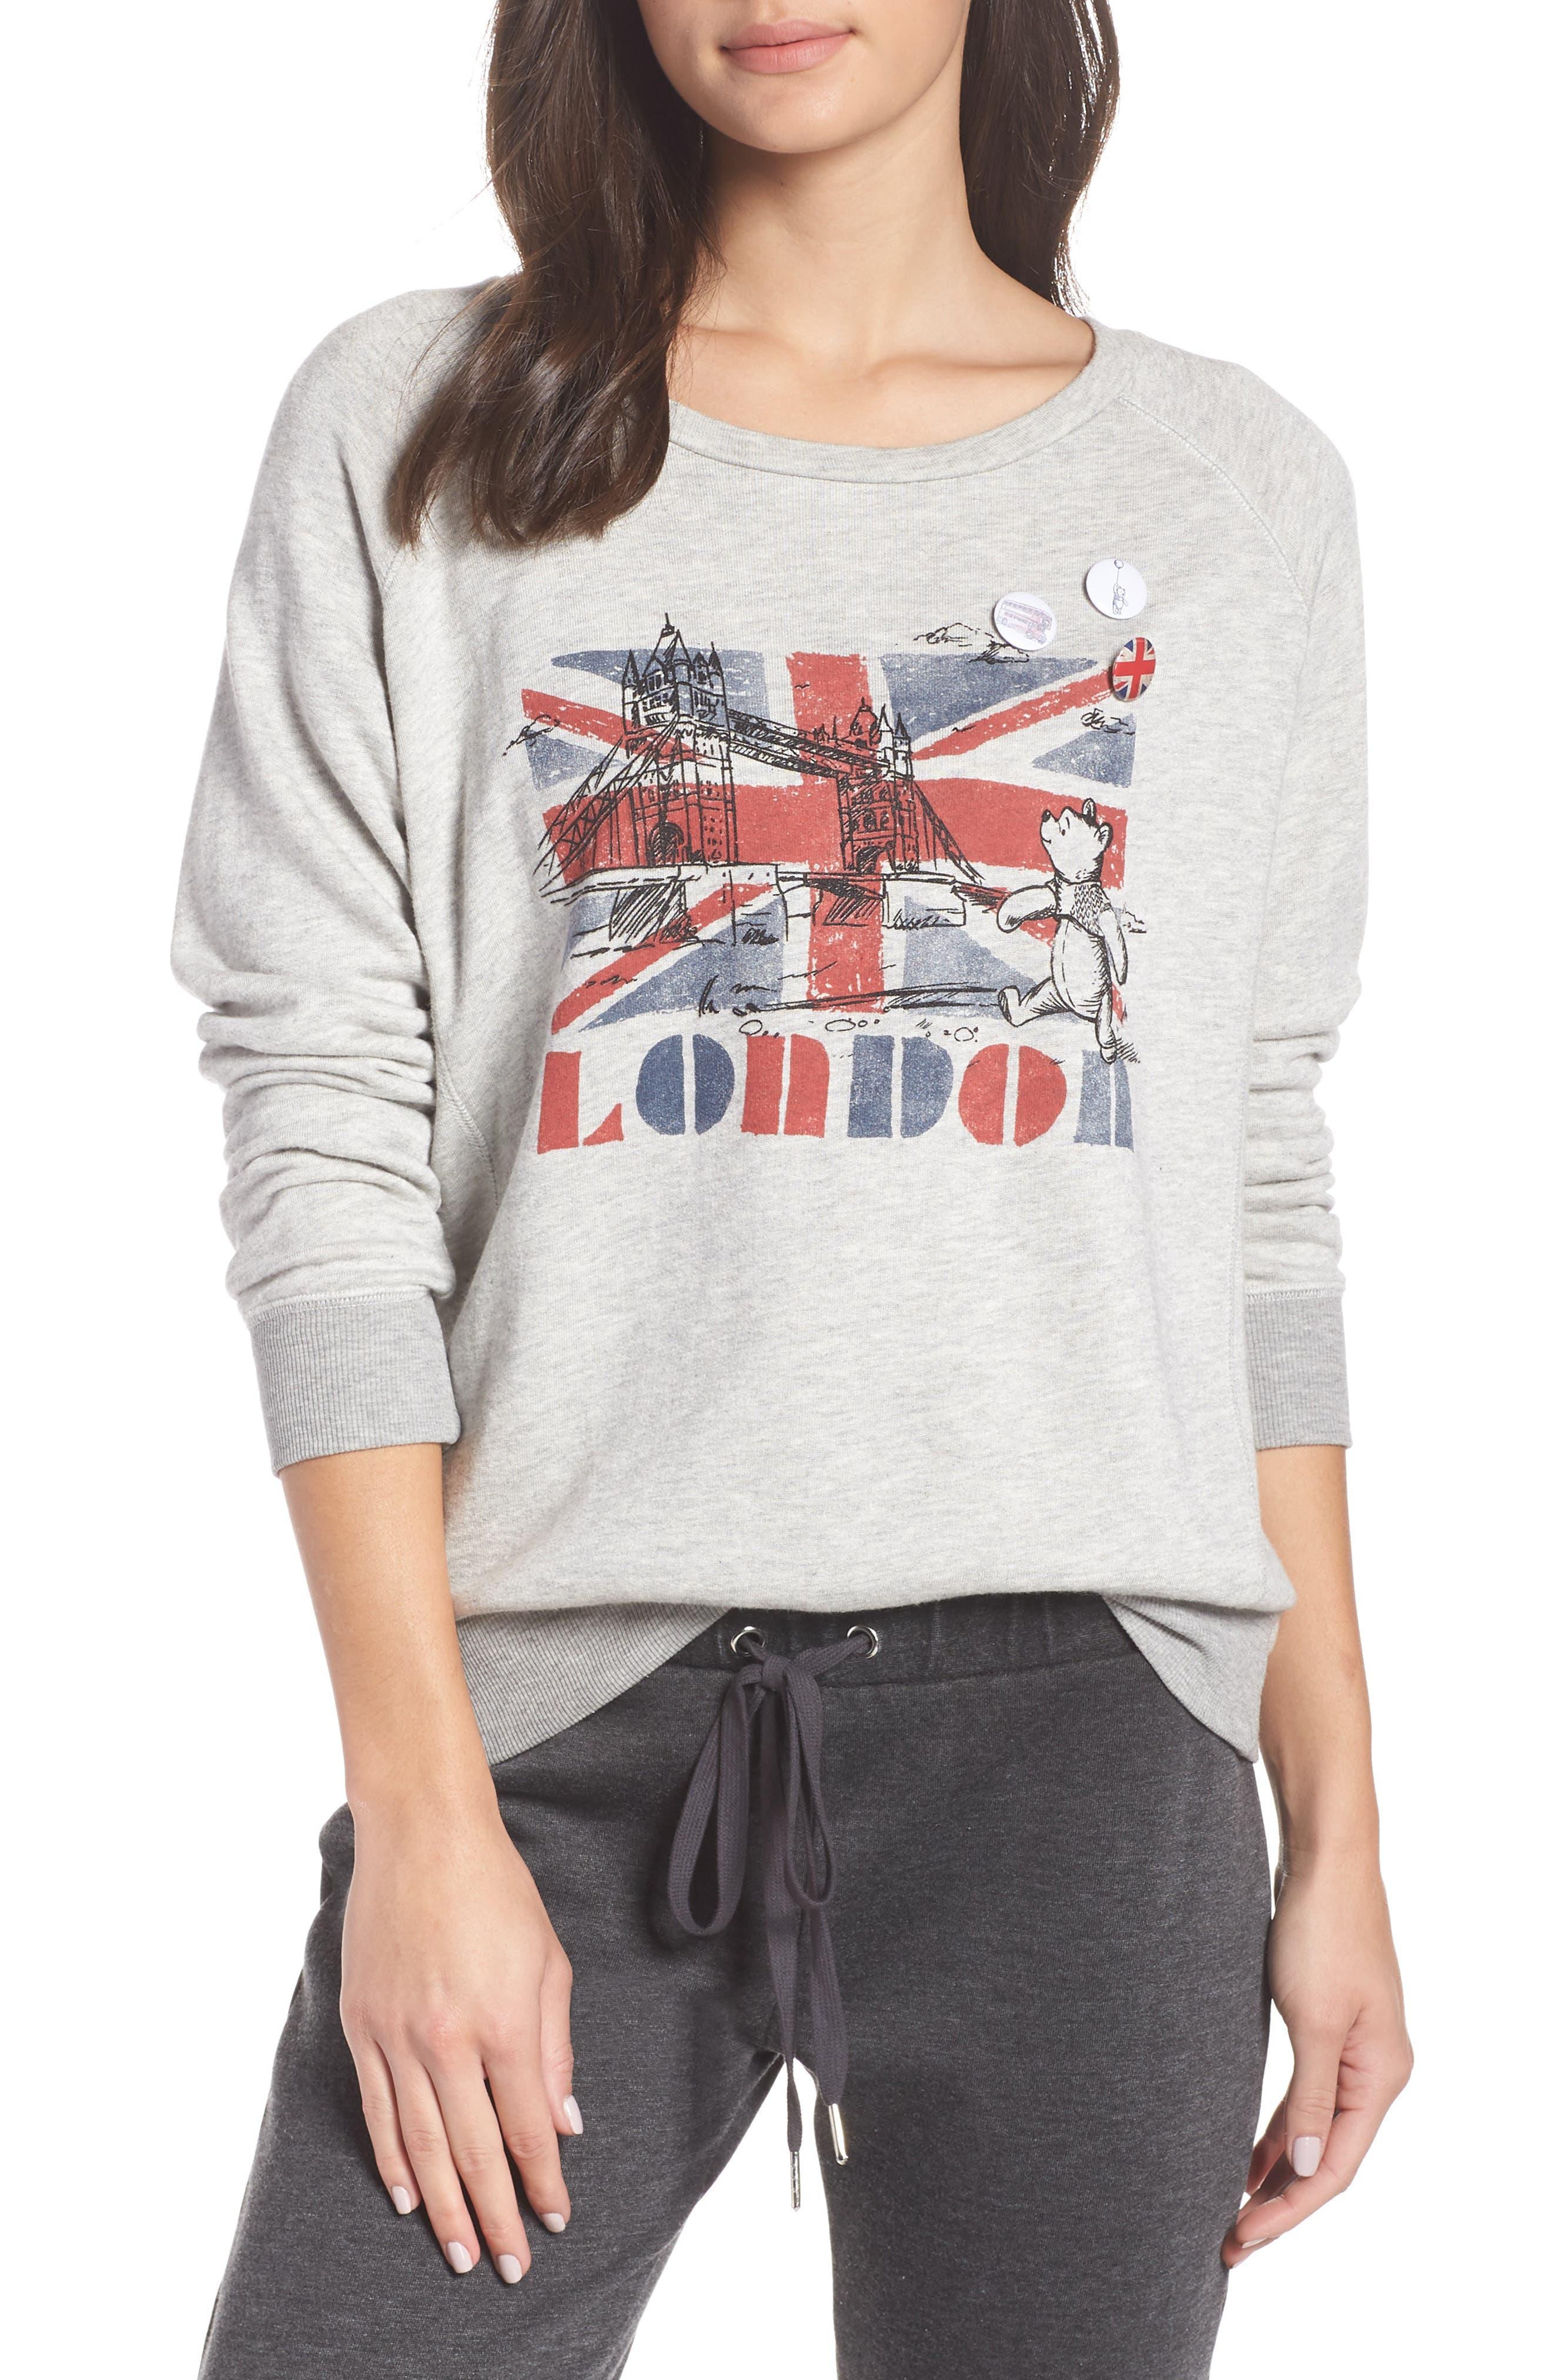 DAVID LERNER London Bridge French Terry Sweatshirt in Heather Grey/ Hea